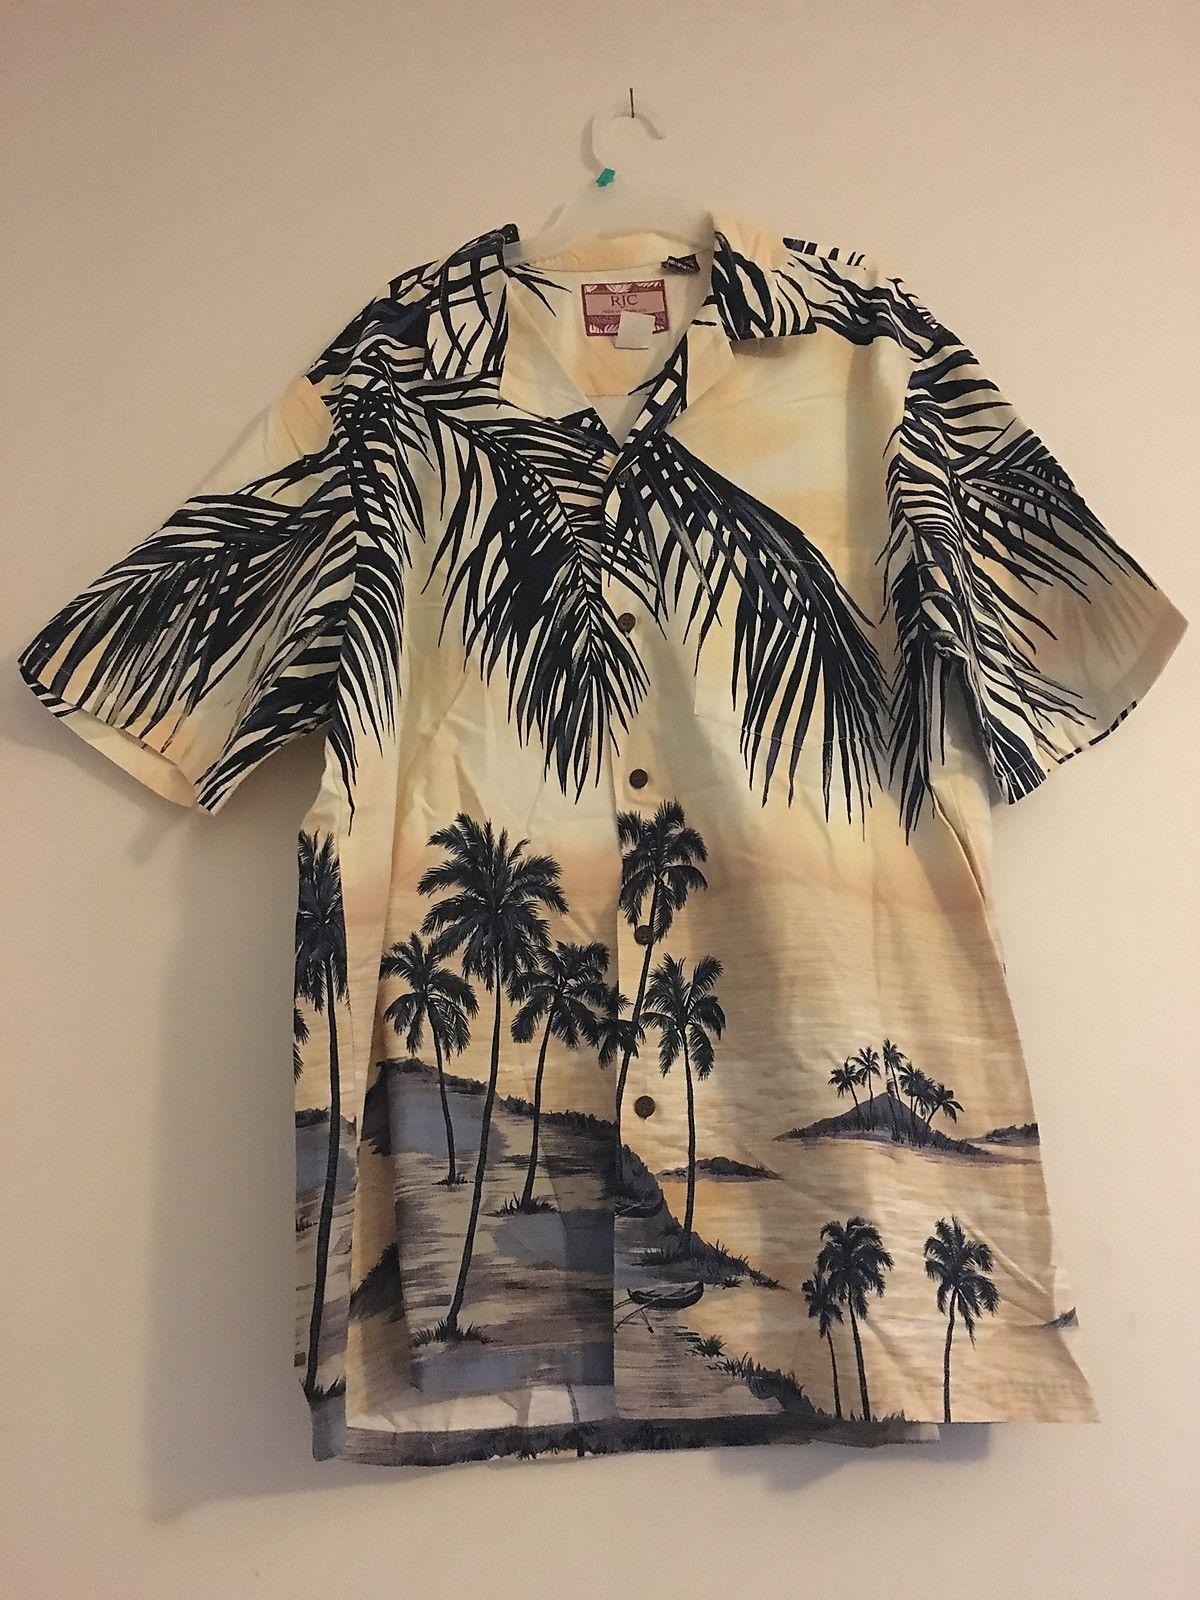 588555e8 Vintage Rjc Hawaiian Aloha Camp Shirt Cream and 43 similar items. S l1600